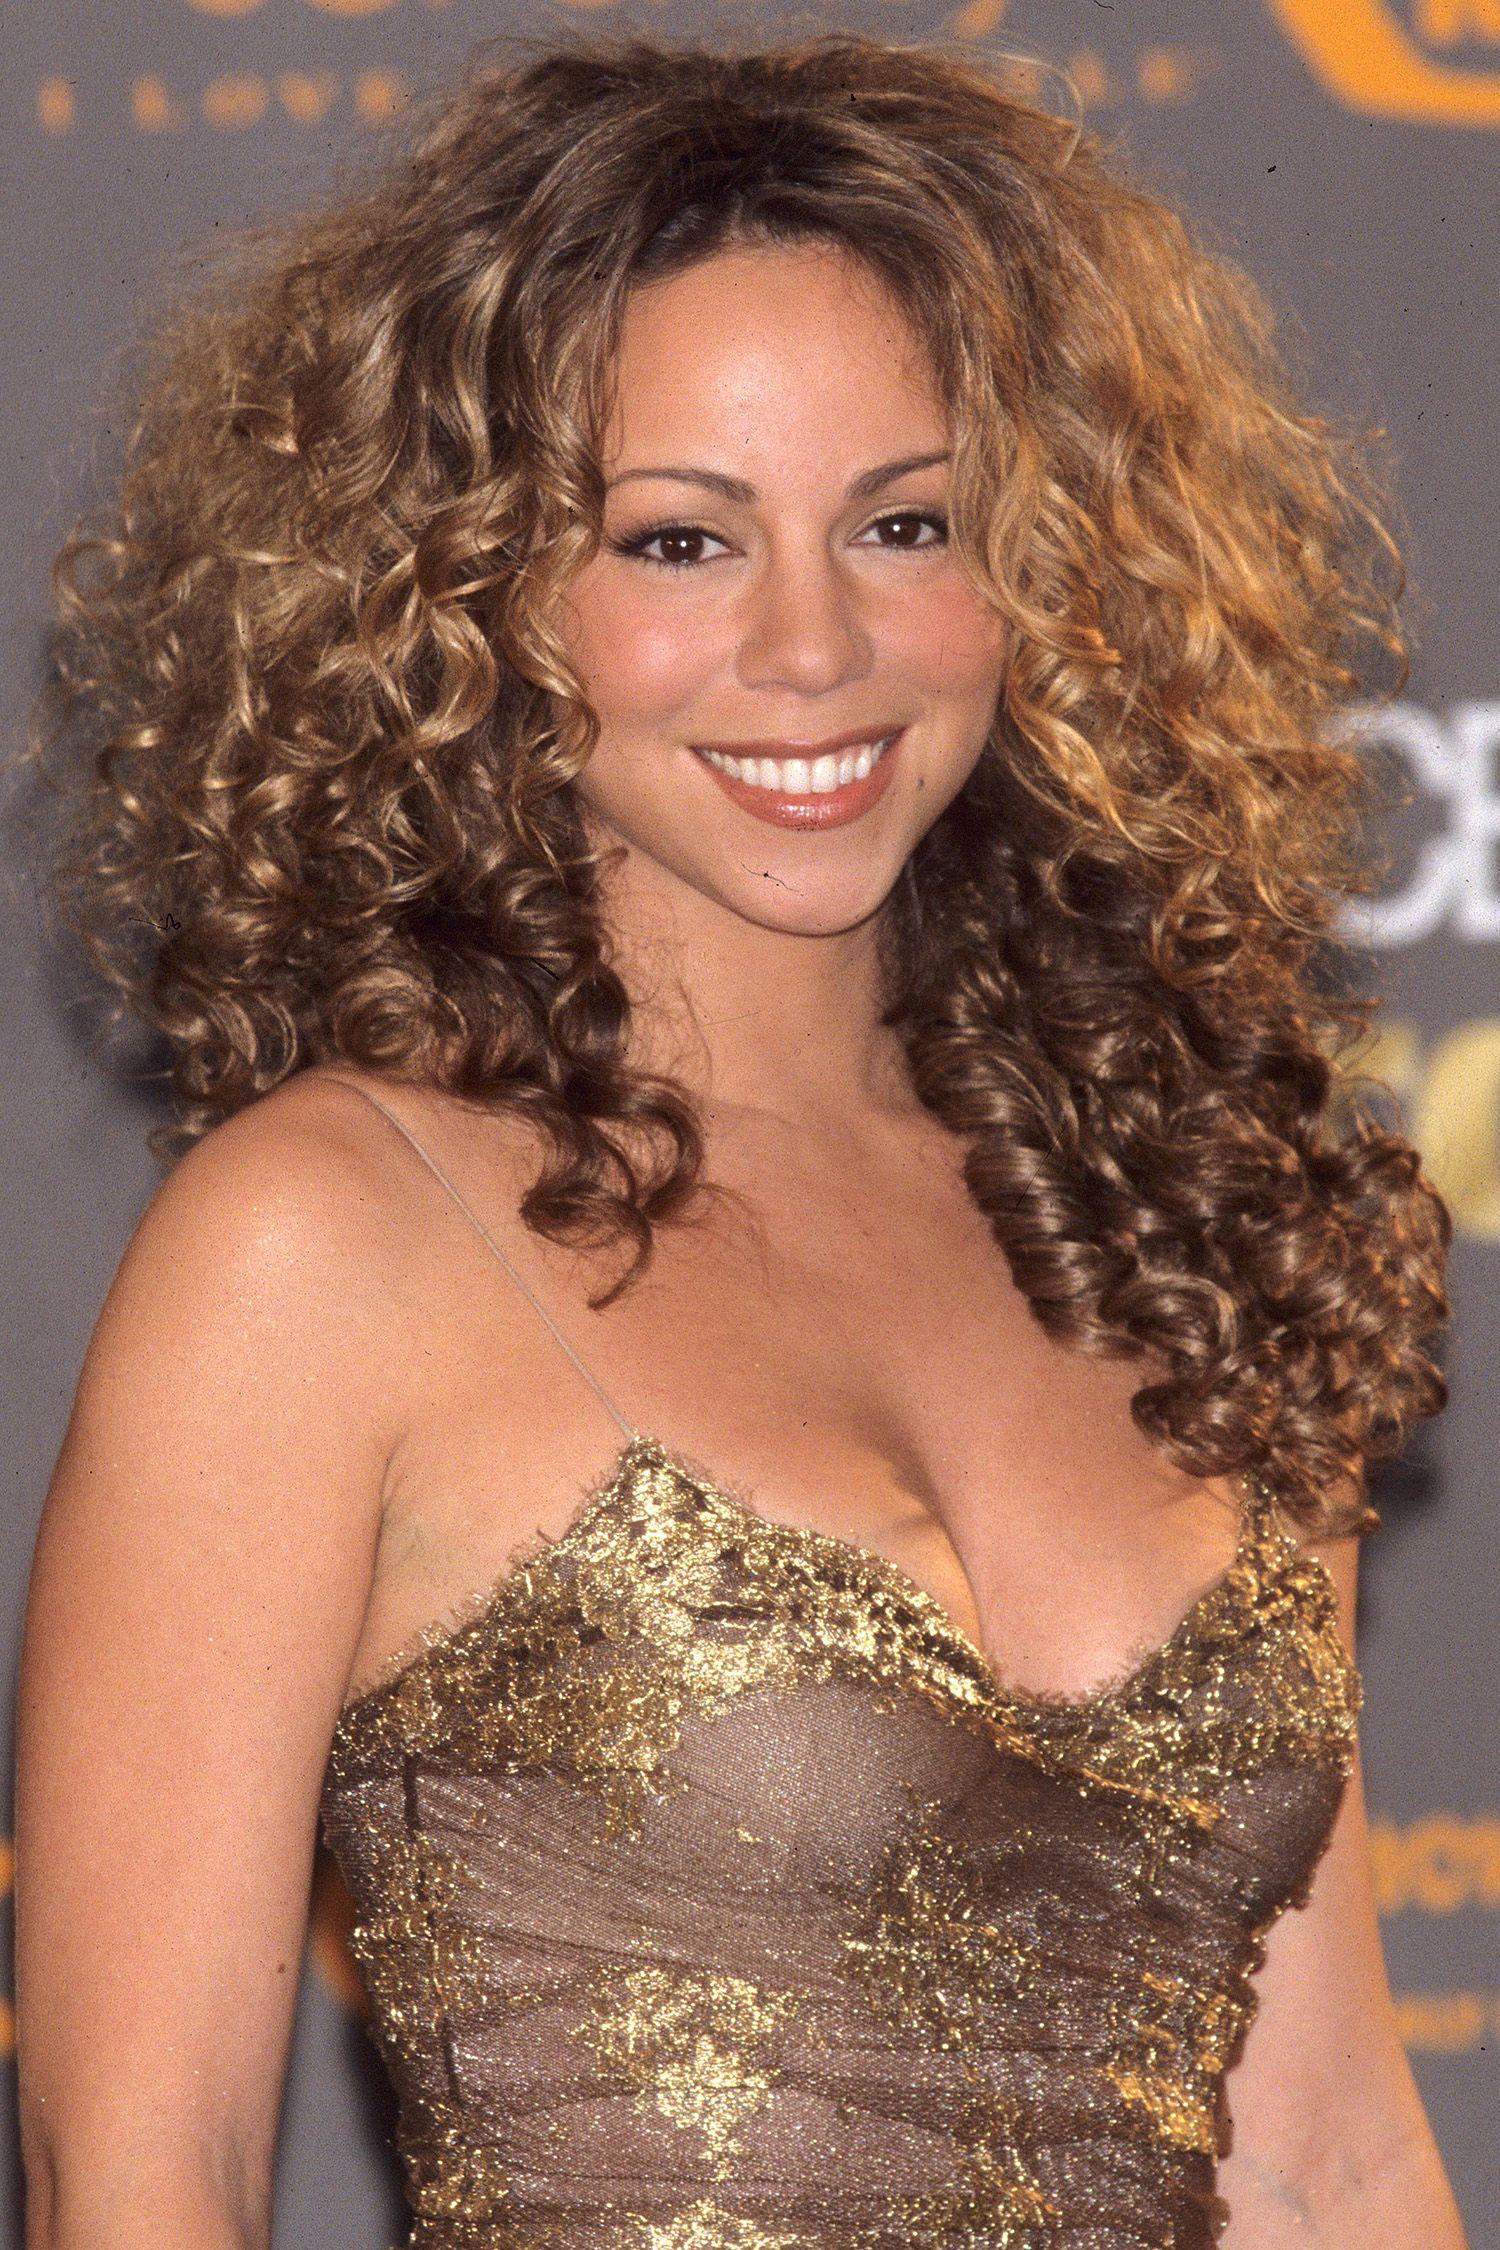 Mariah Carey (Photo by Jim Spellman/WireImage)